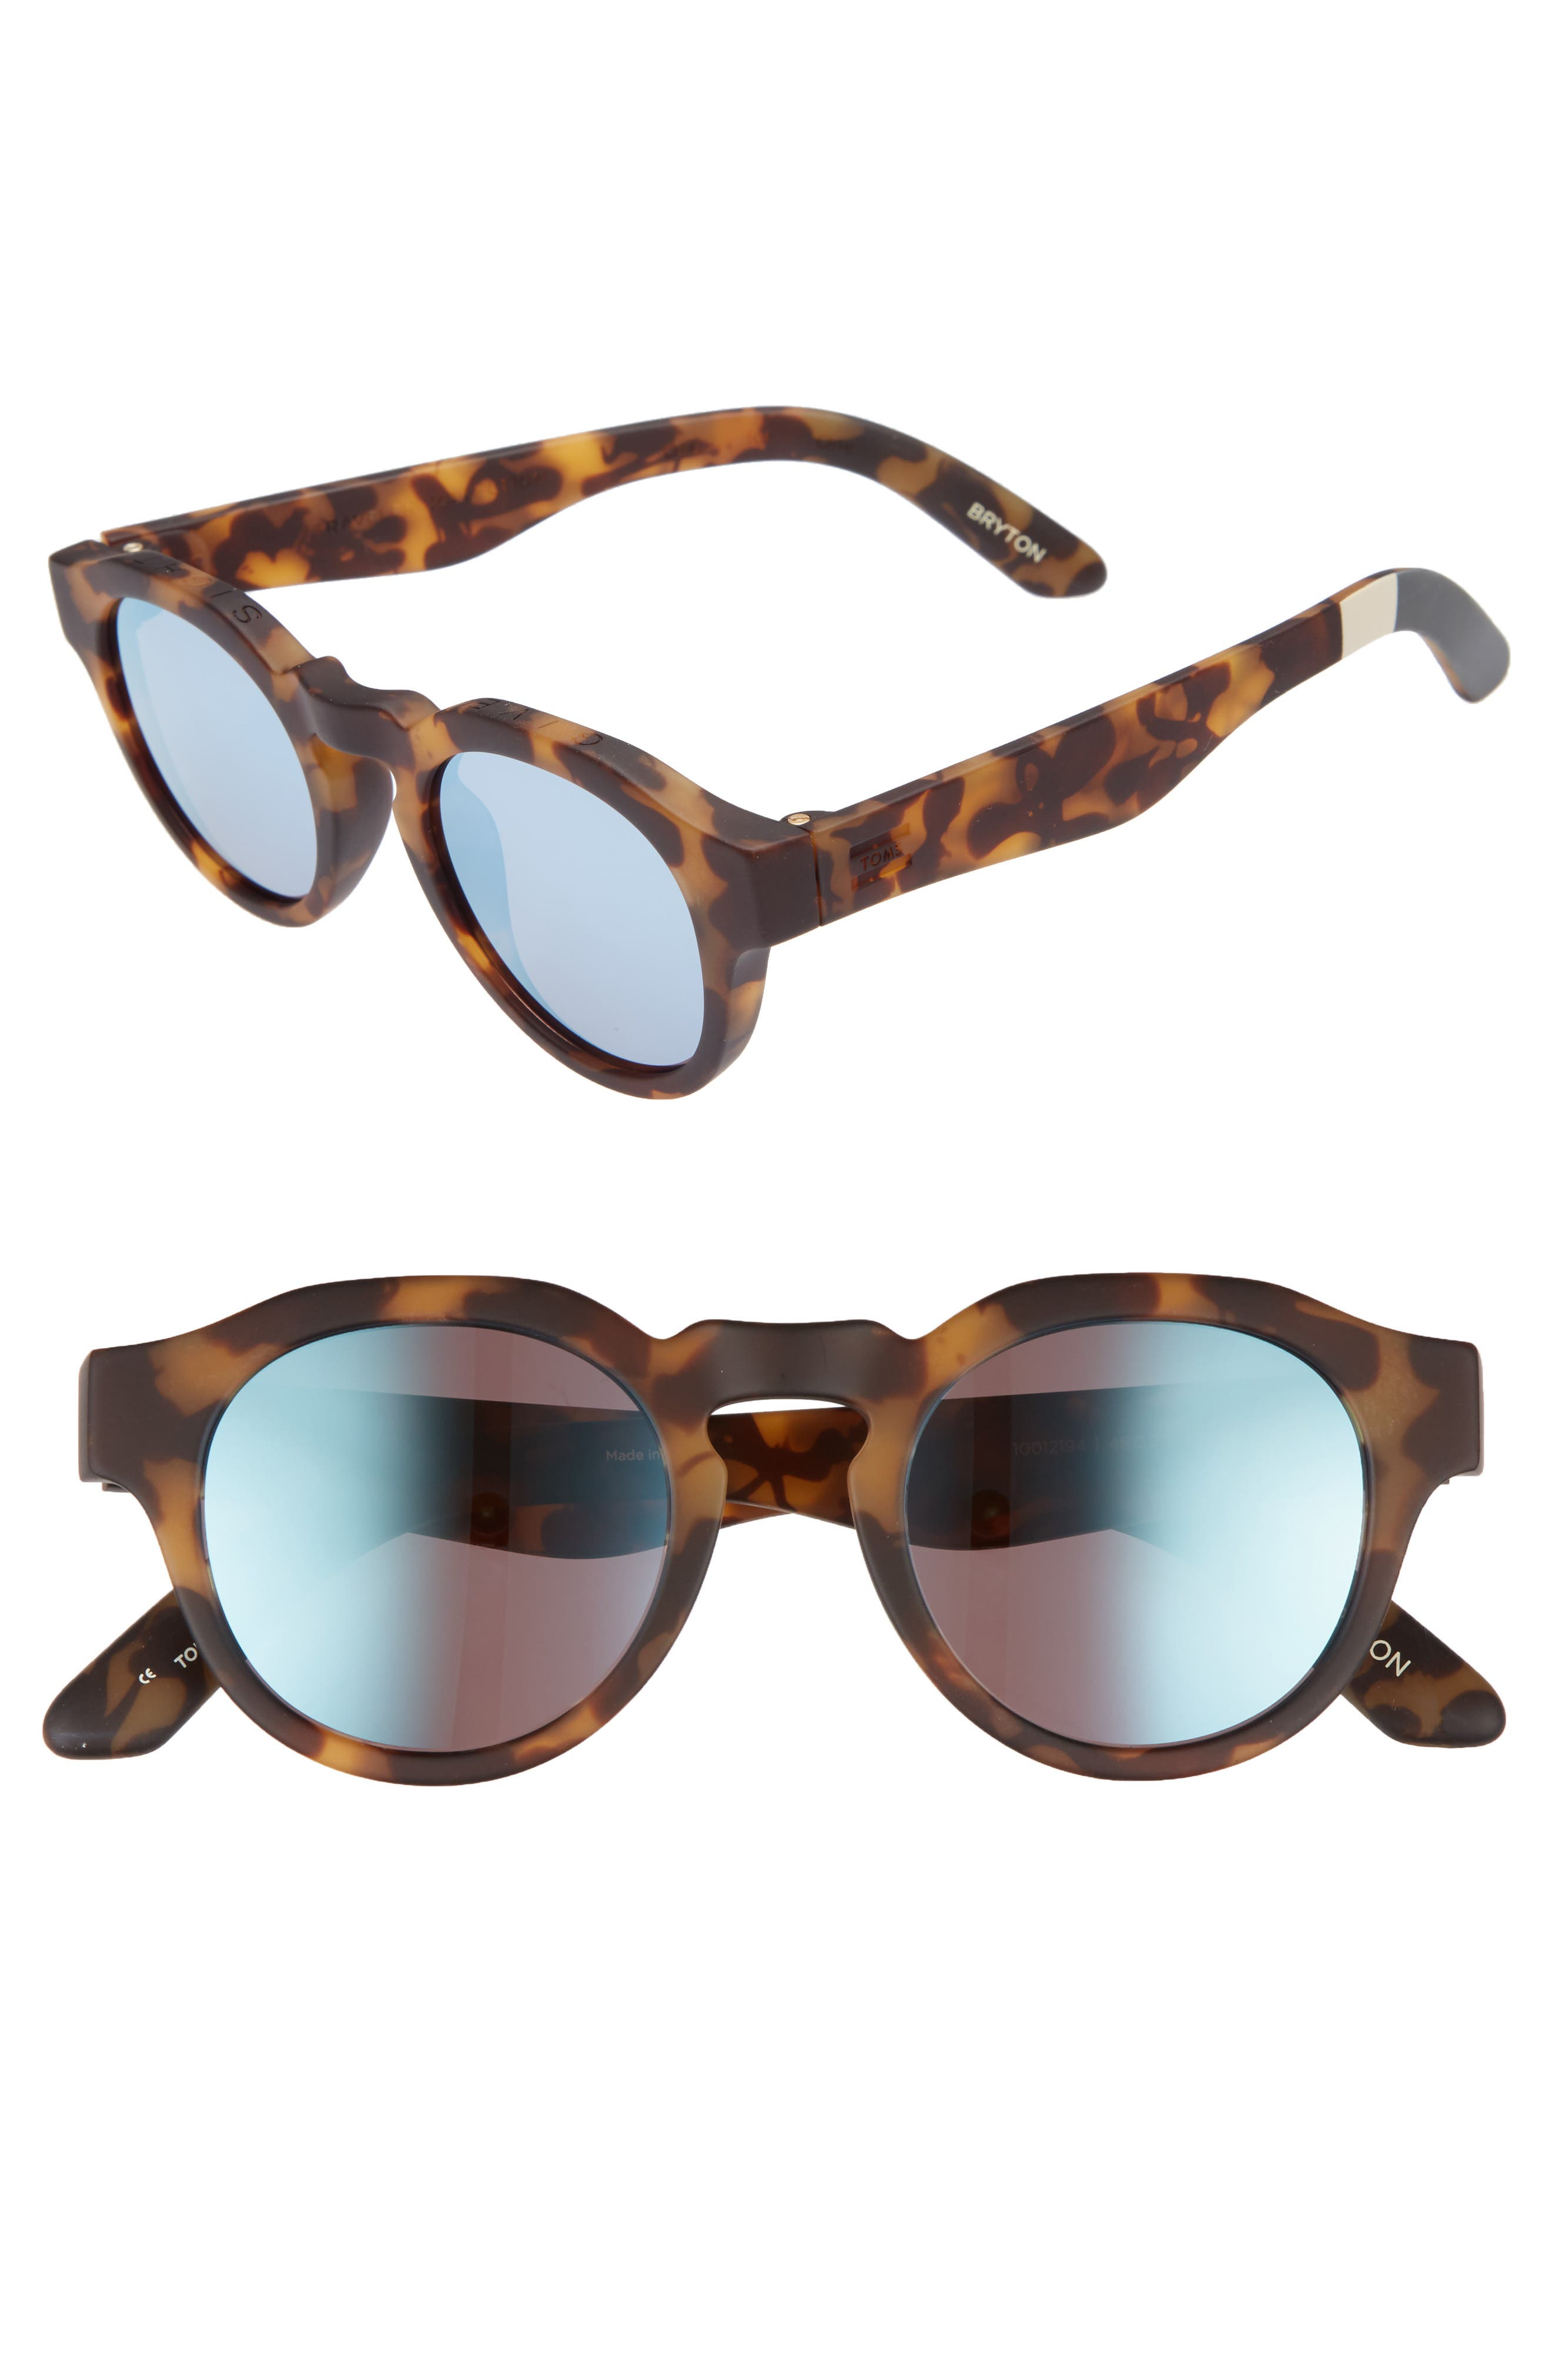 Bryton 48mm Sunglasses,                             Main thumbnail 1, color,                             BLONDE TORTOISE